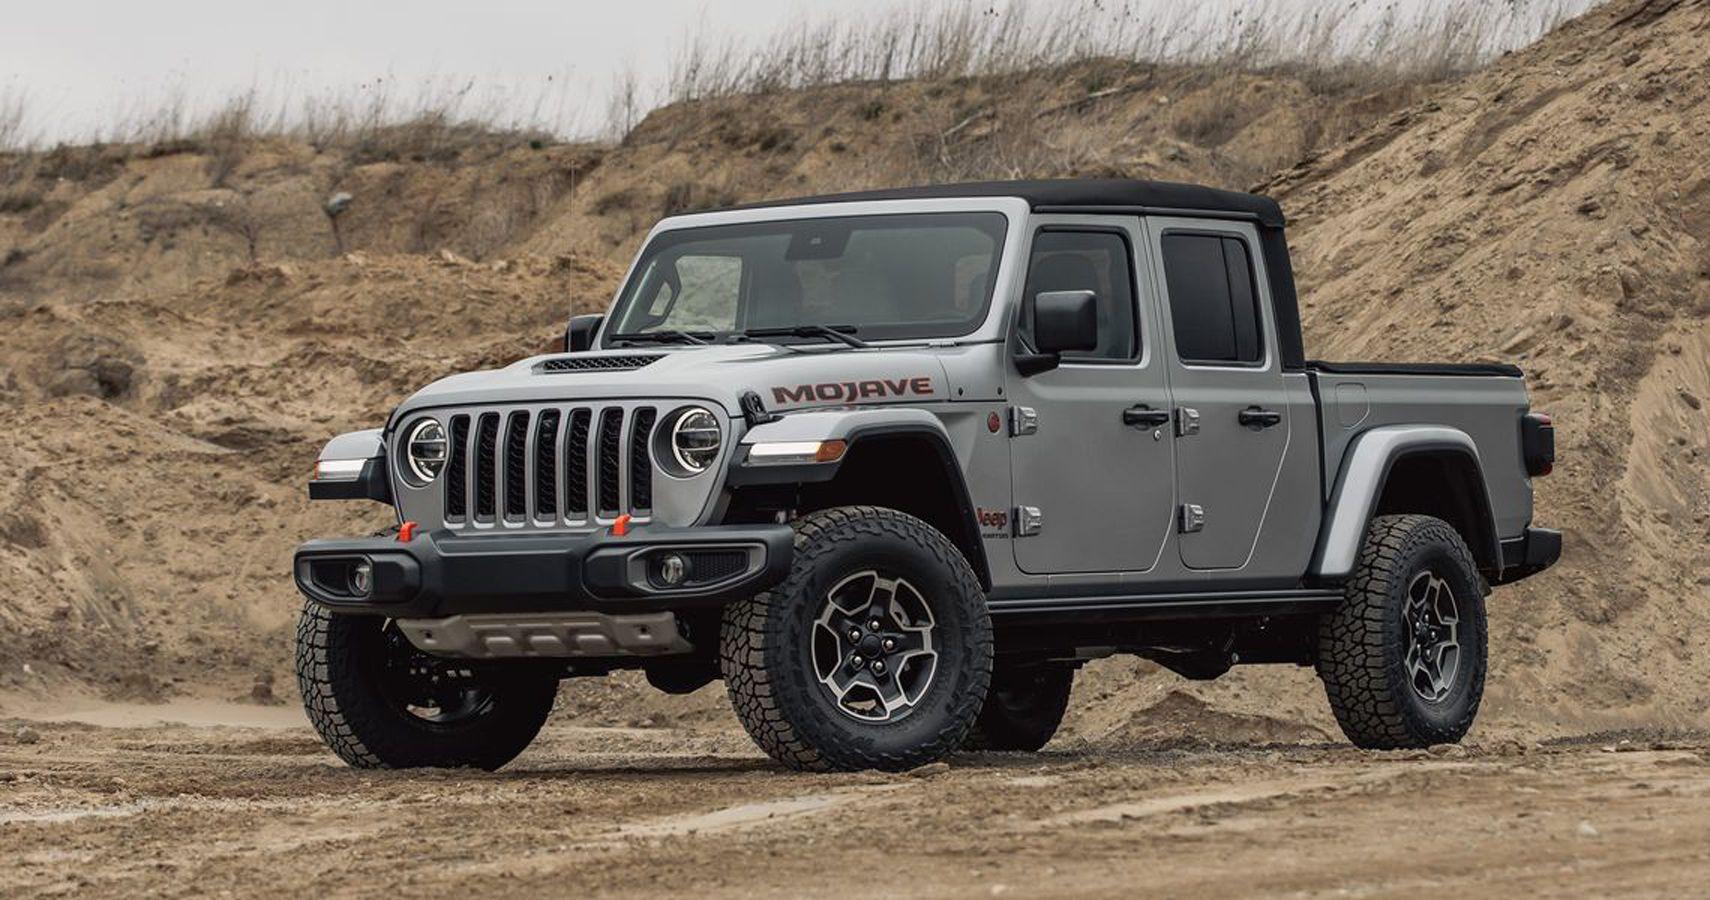 Motorweek Test Drives The 2020 Jeep Gladiator Mojave